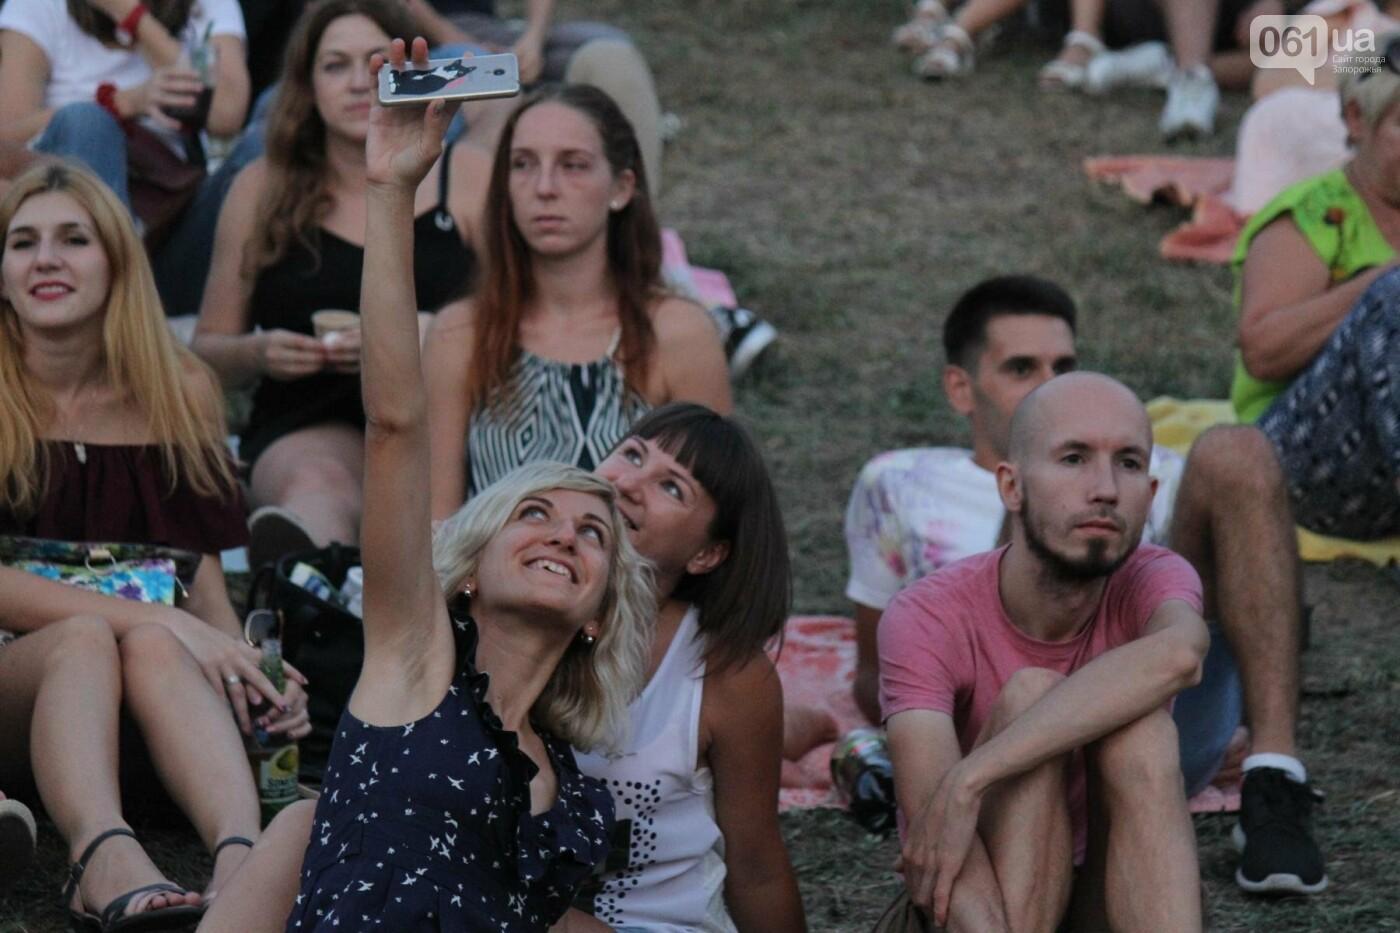 Найди себя: 50 портретов посетителей фестиваля Khortytsia Freedom, – ФОТОРЕПОРТАЖ, фото-12